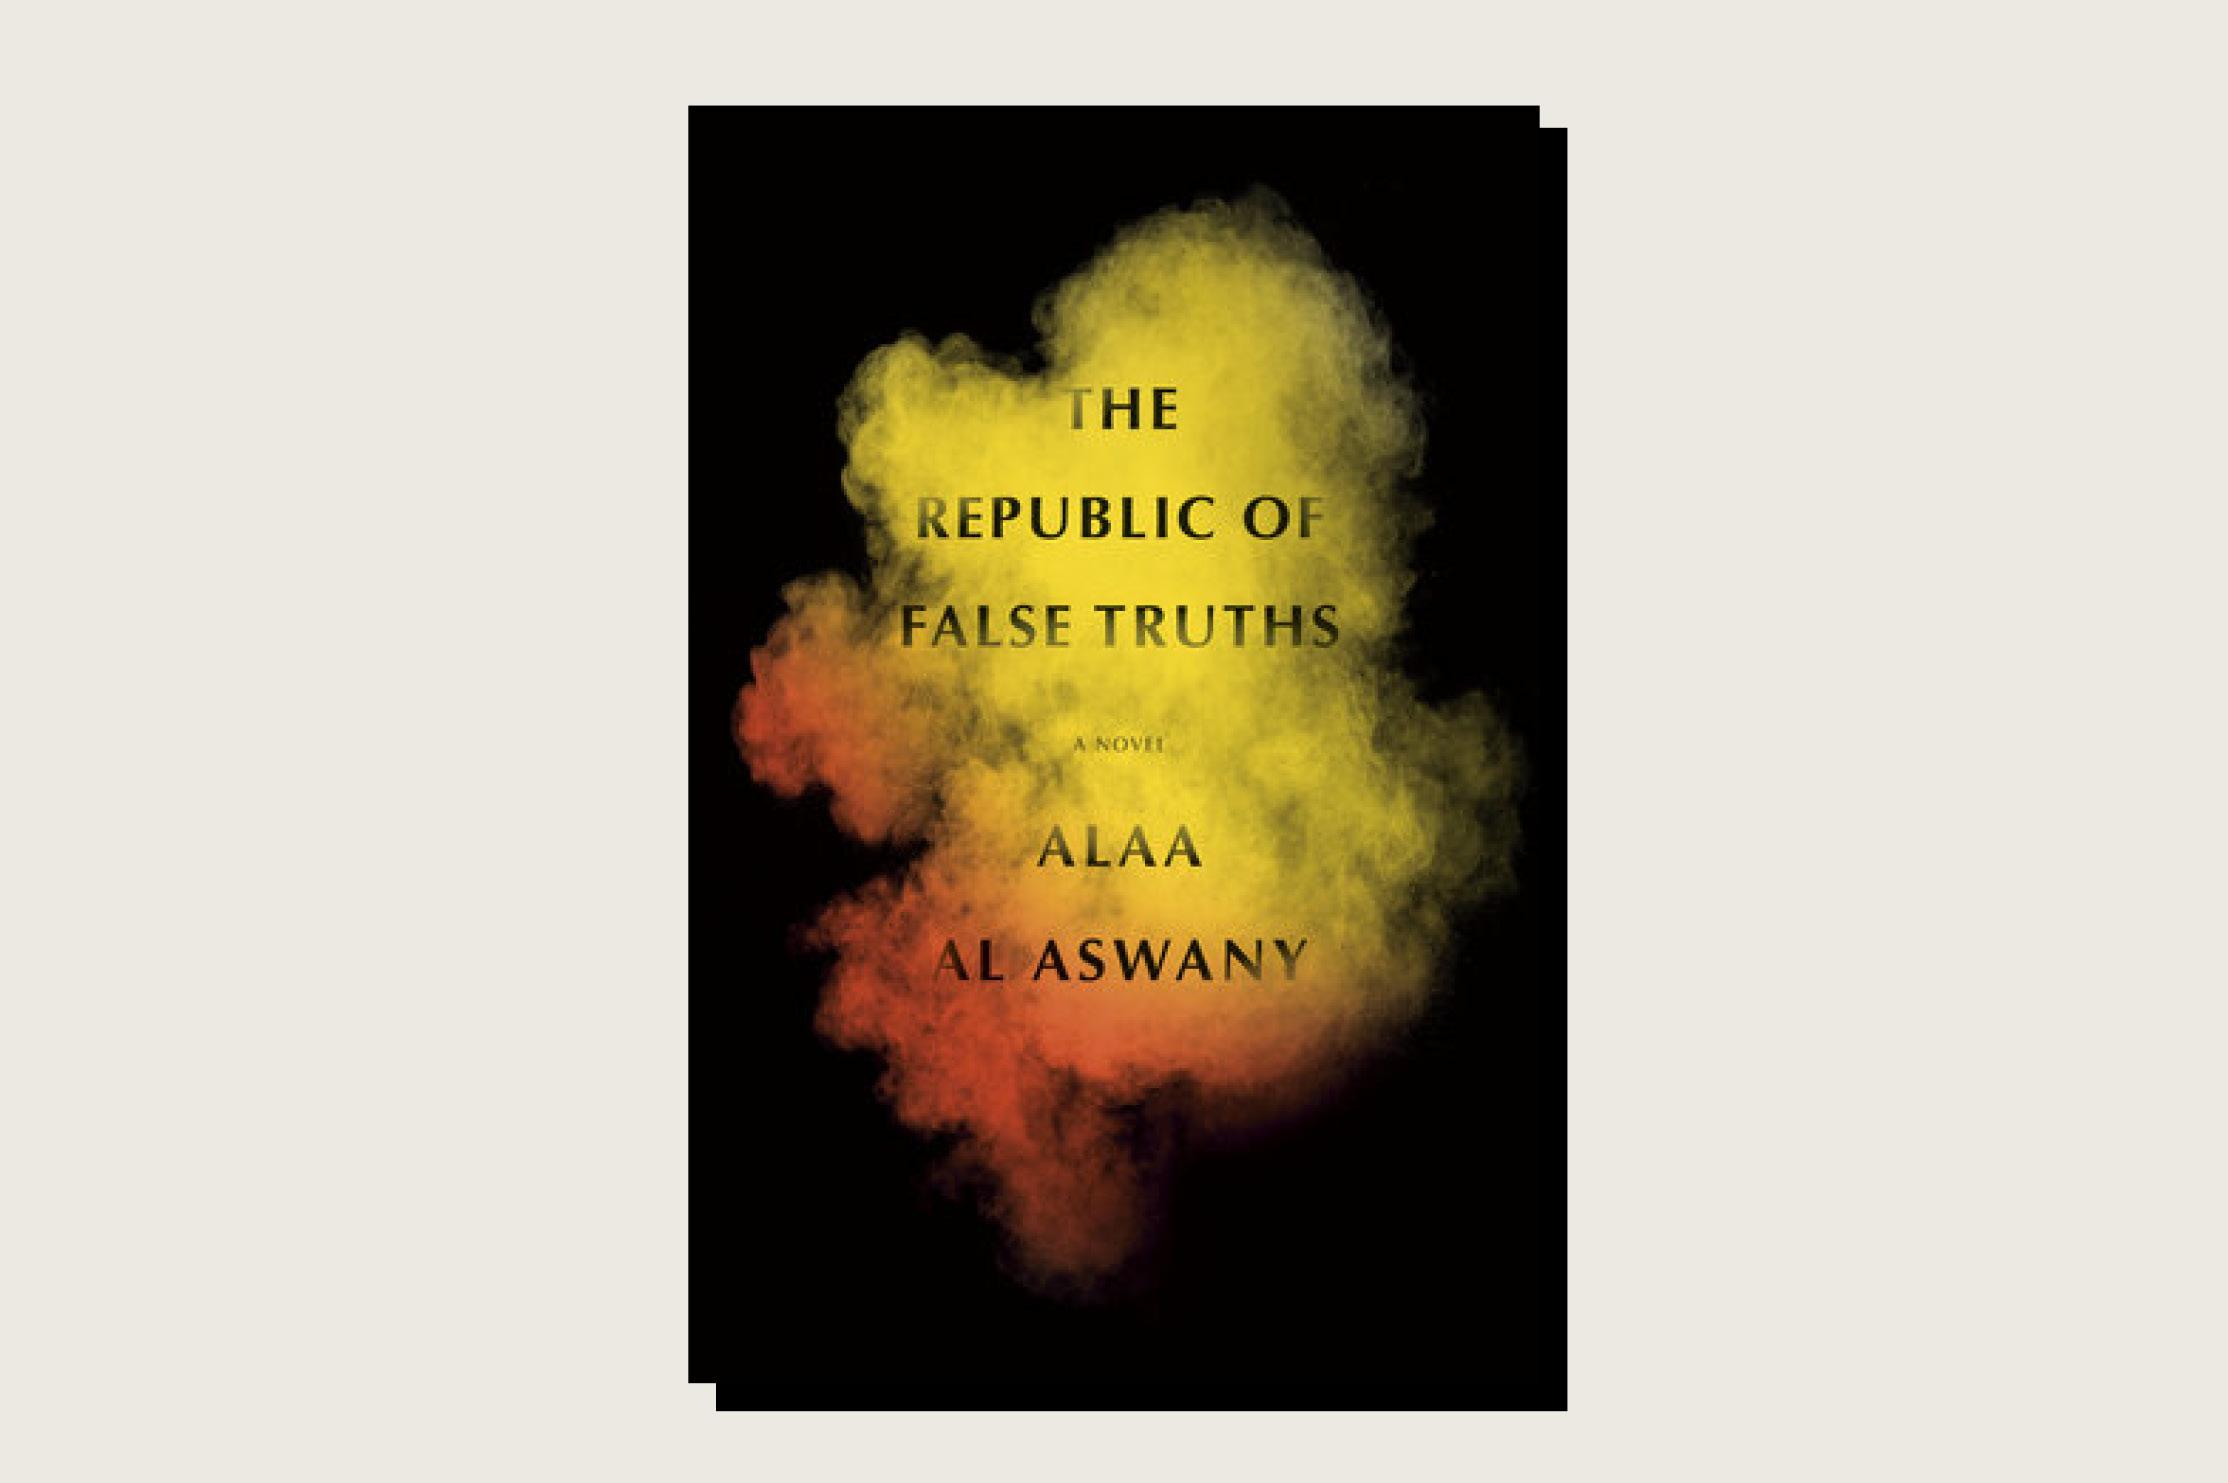 The Republic of False Truths, Alaa al-Aswany, Knopf, 416 pp., .95, August 2021